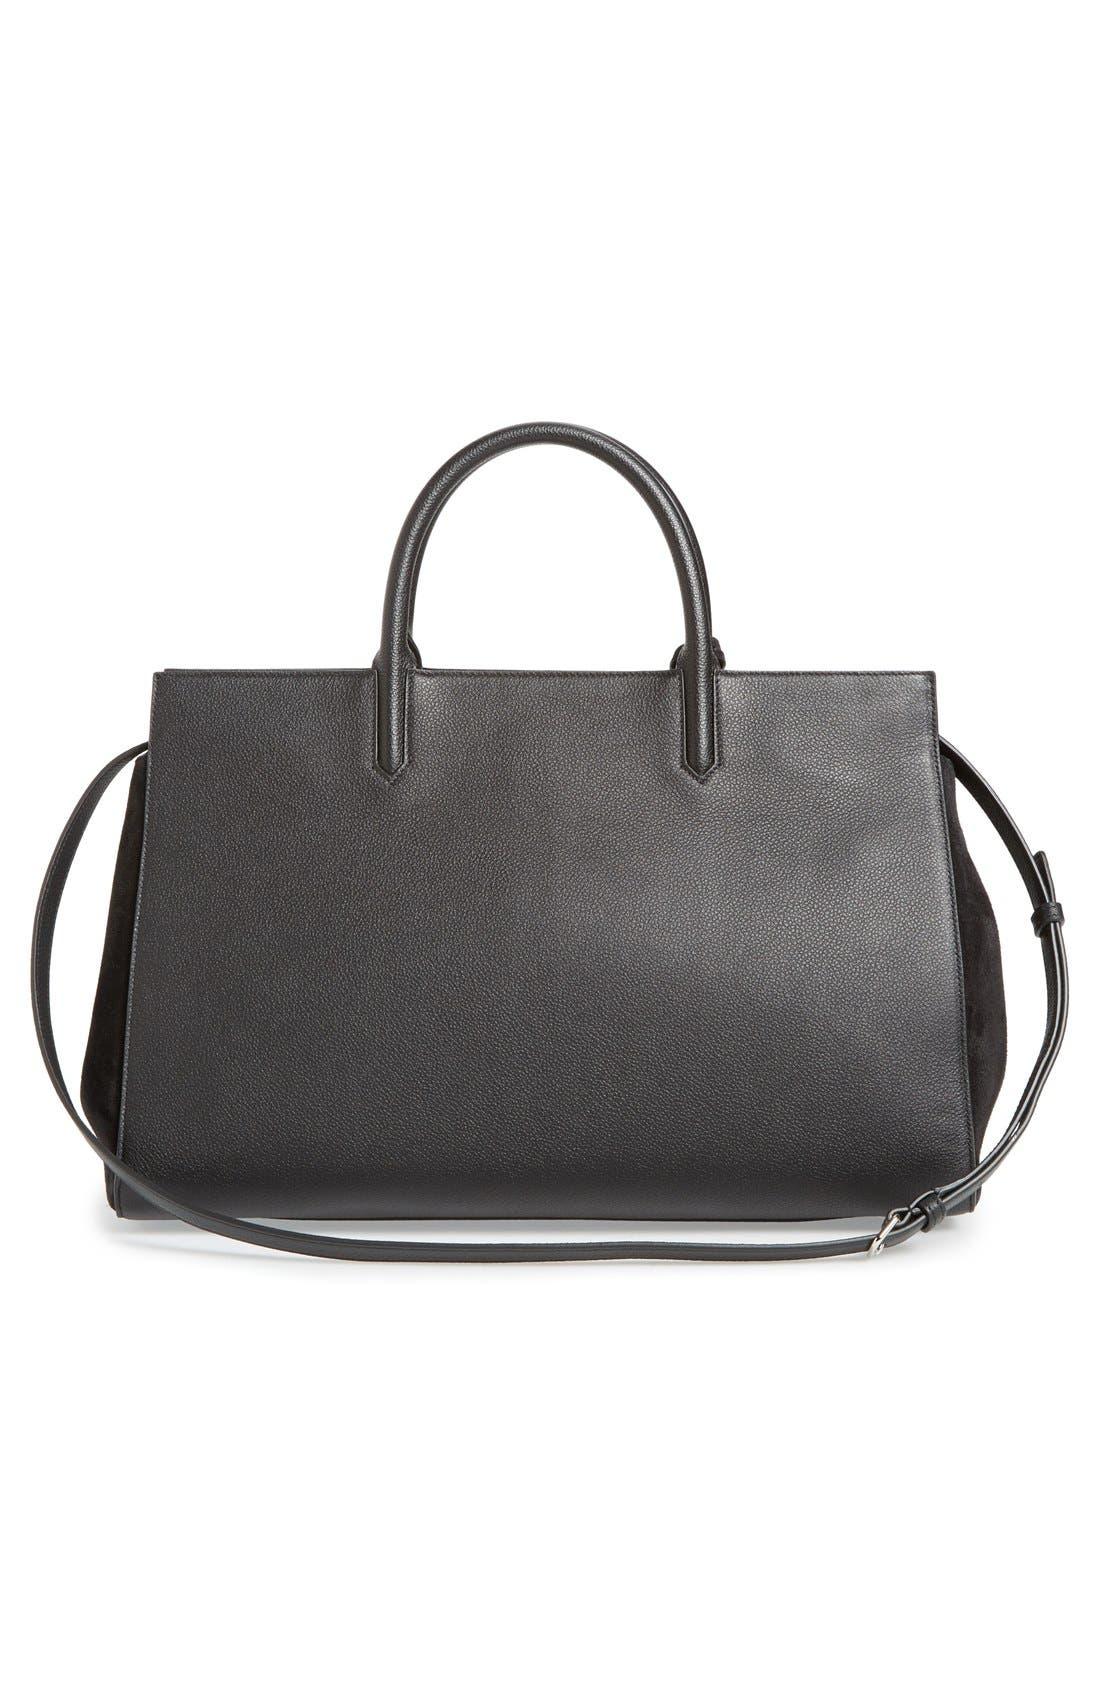 Alternate Image 3  - Saint Laurent 'Medium Rive Gauche' Grained Leather Satchel